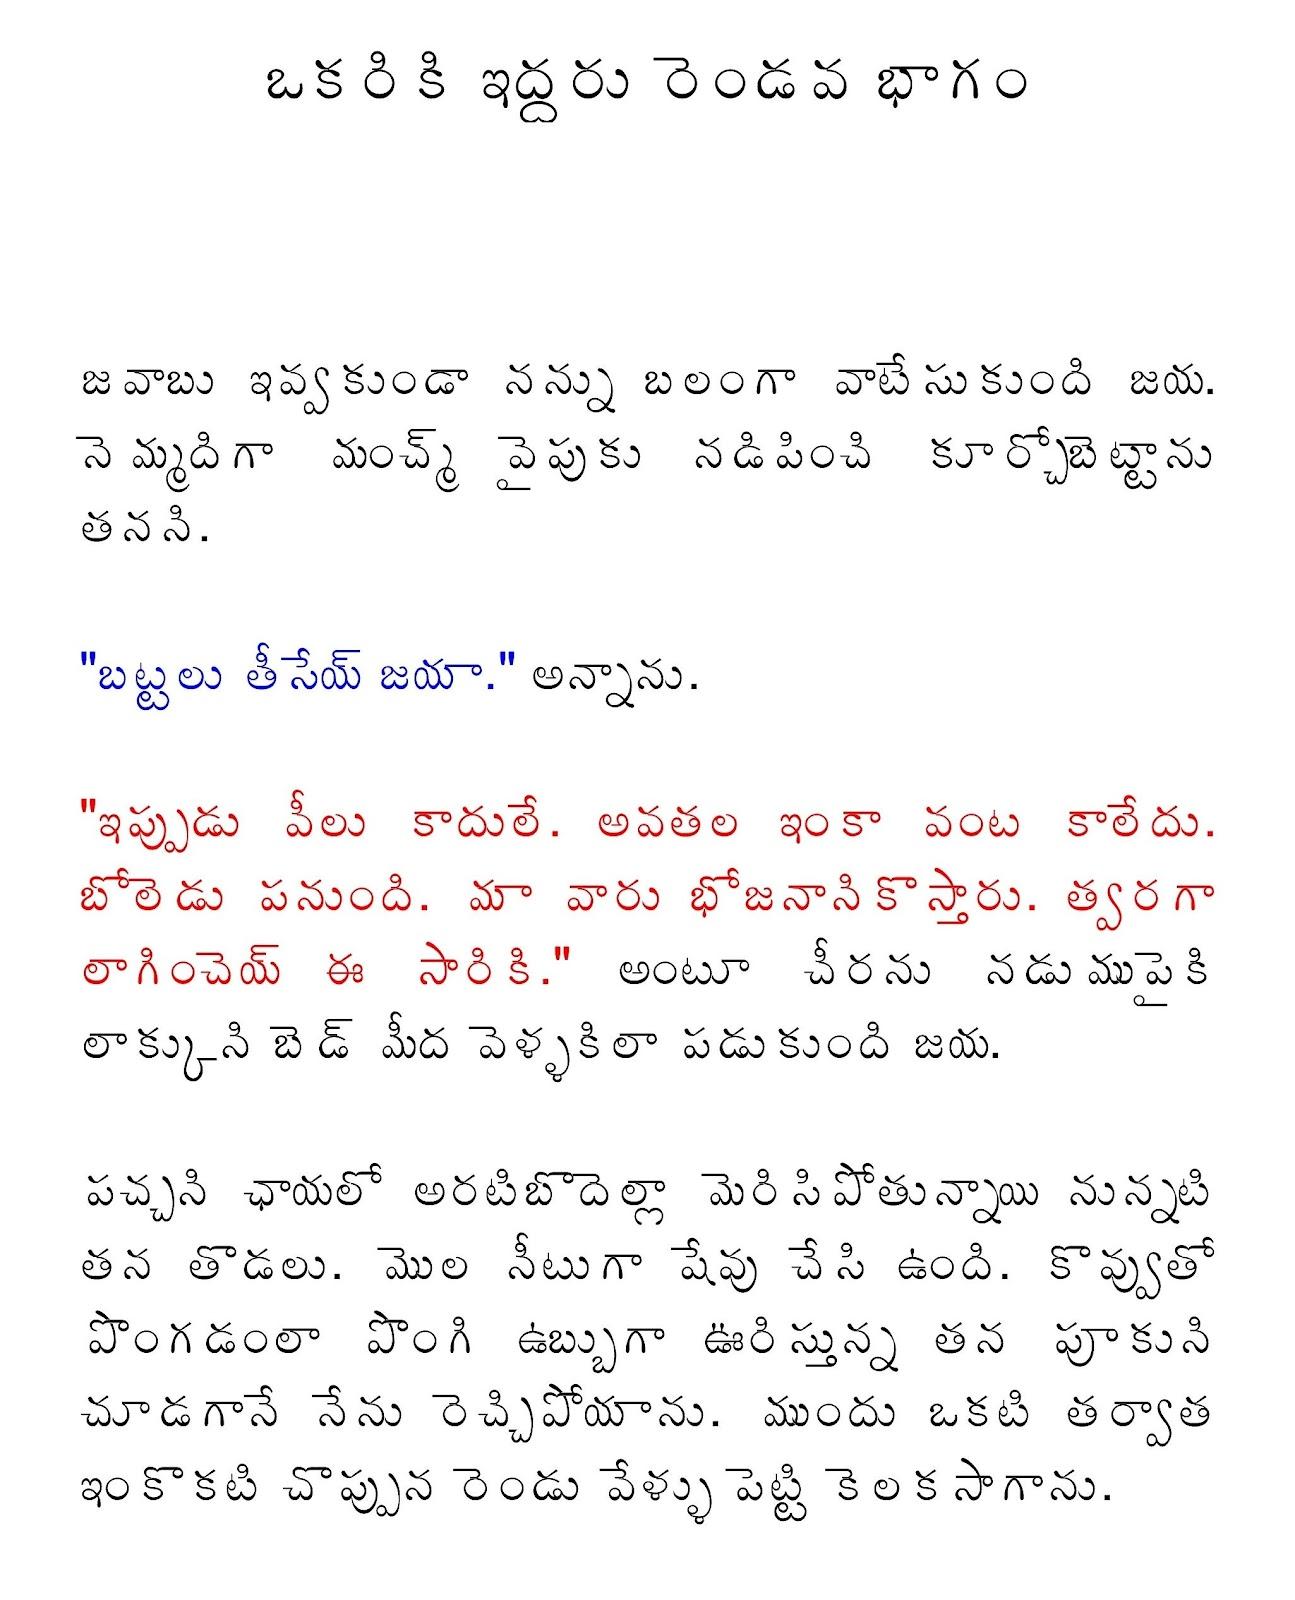 Akka tho dengulata. Akka tho oka rathriTammu Ditoa (Telugu